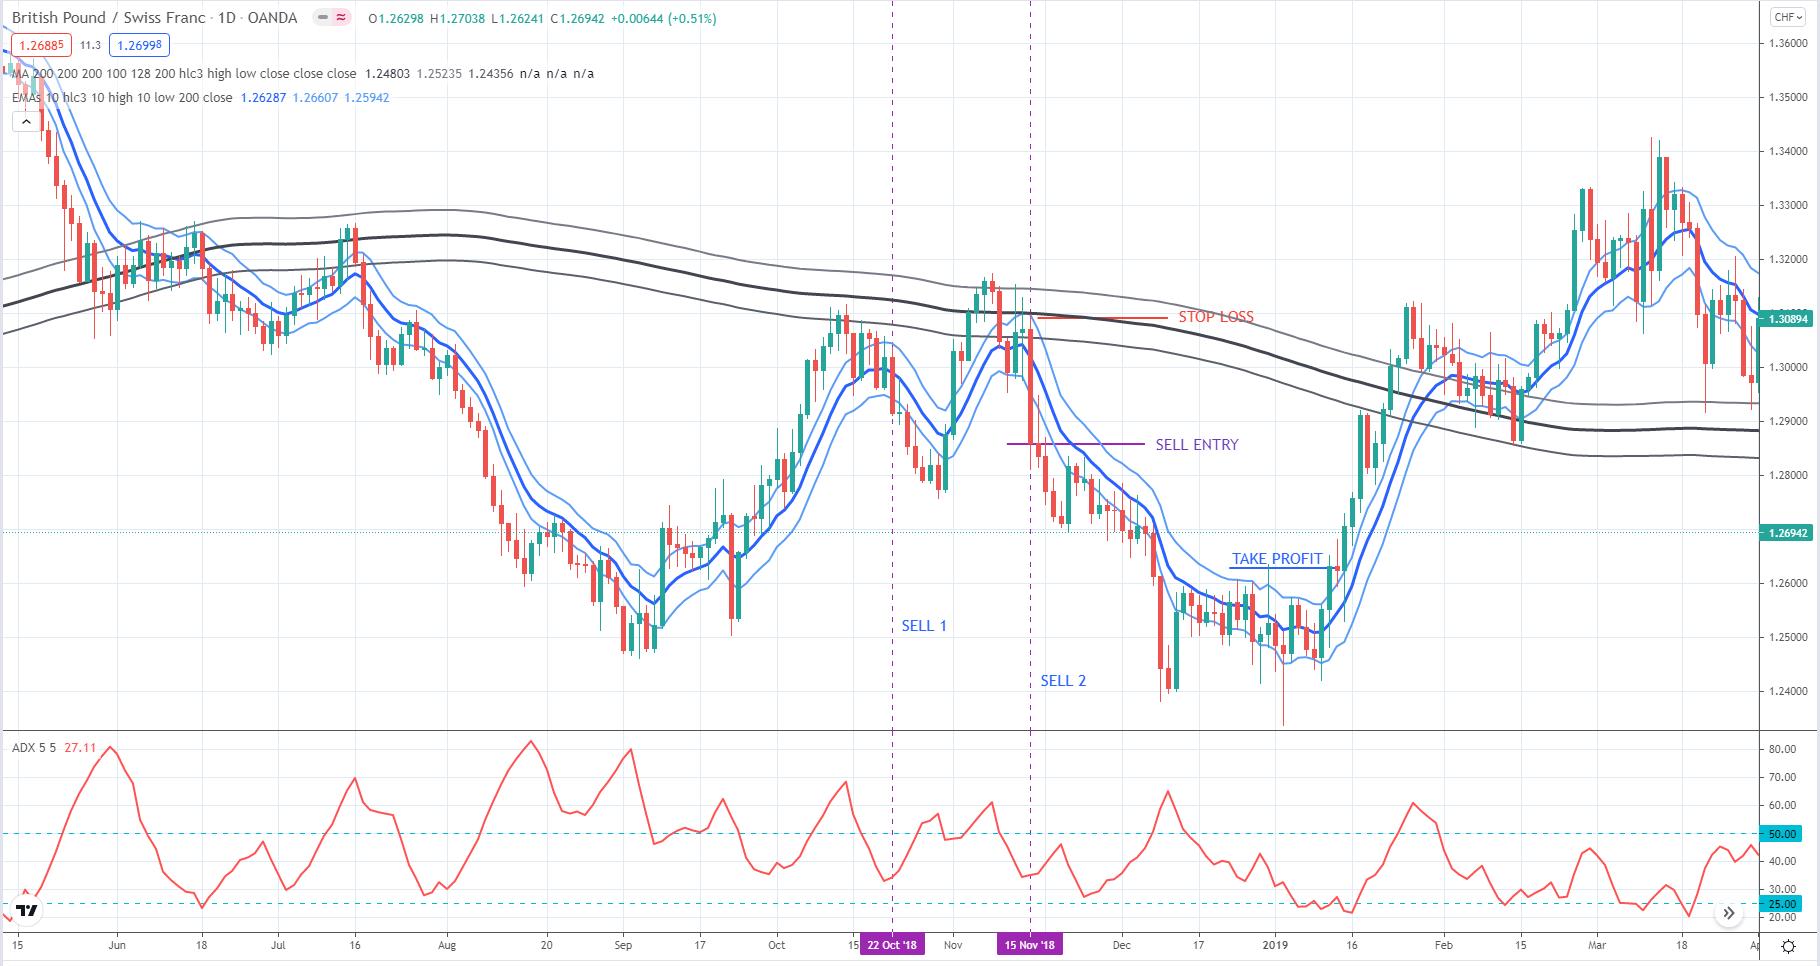 British Pound / Swiss Franc